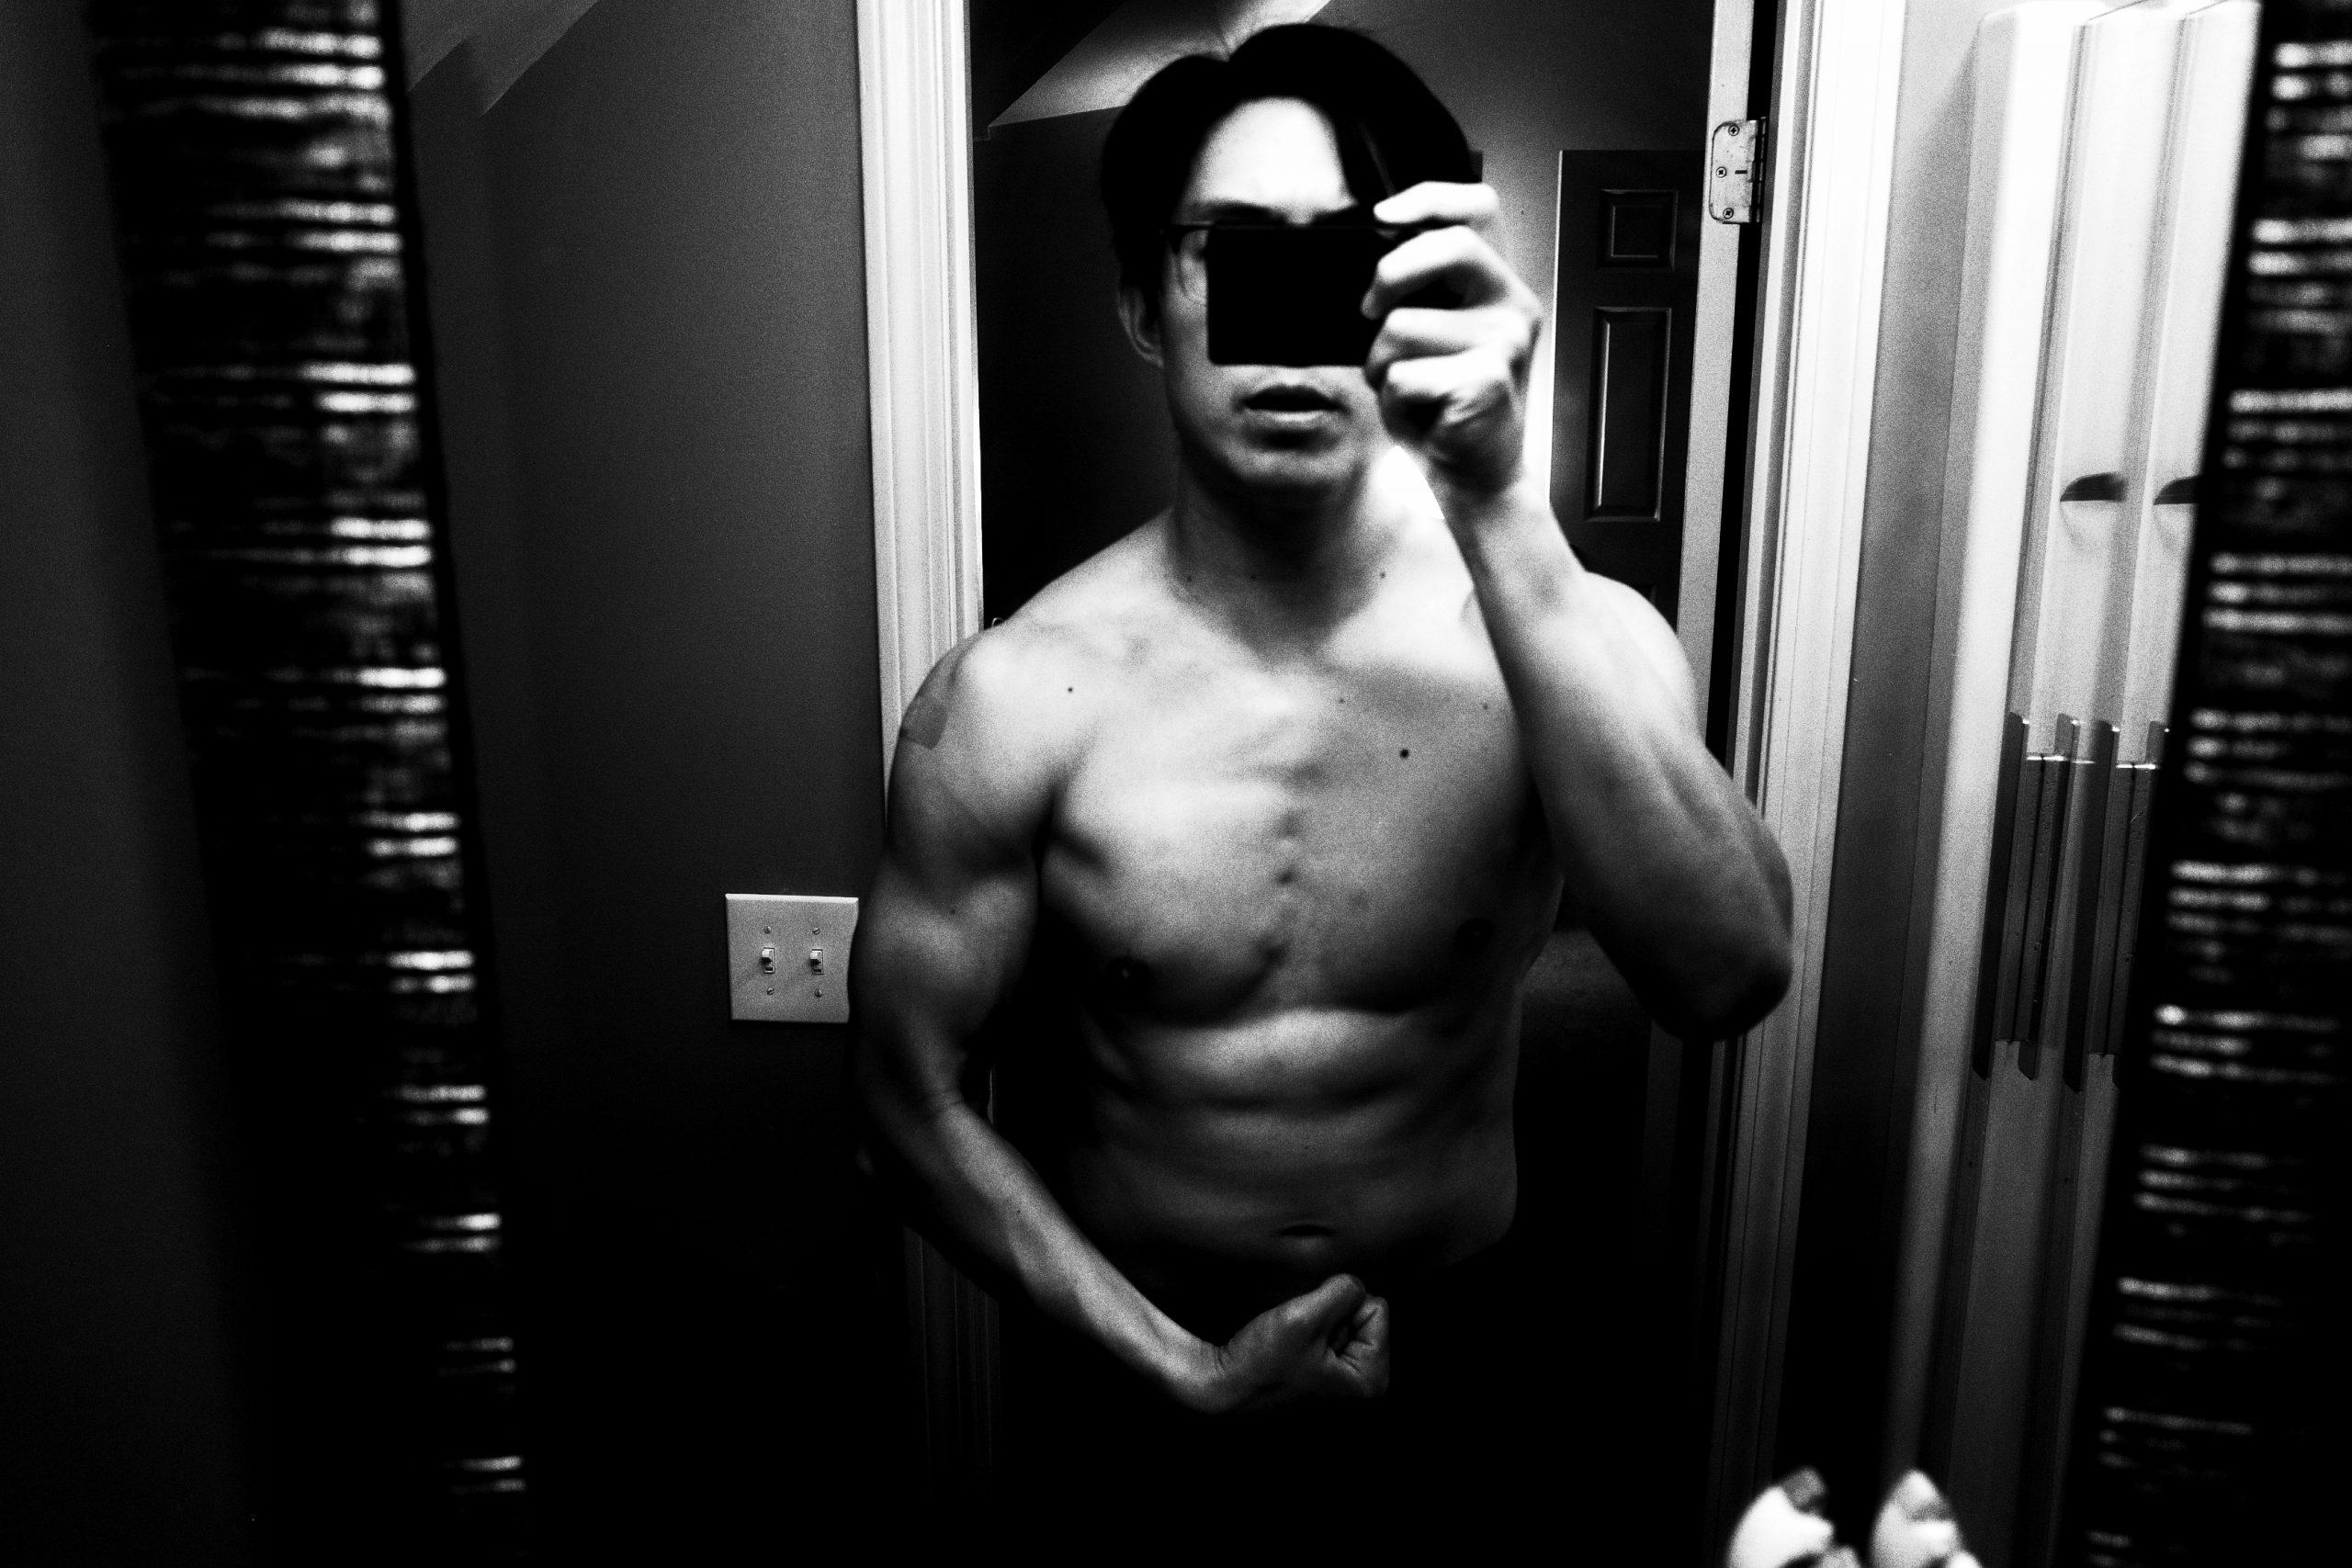 Greek bodybuilder big ass Love Of The Body